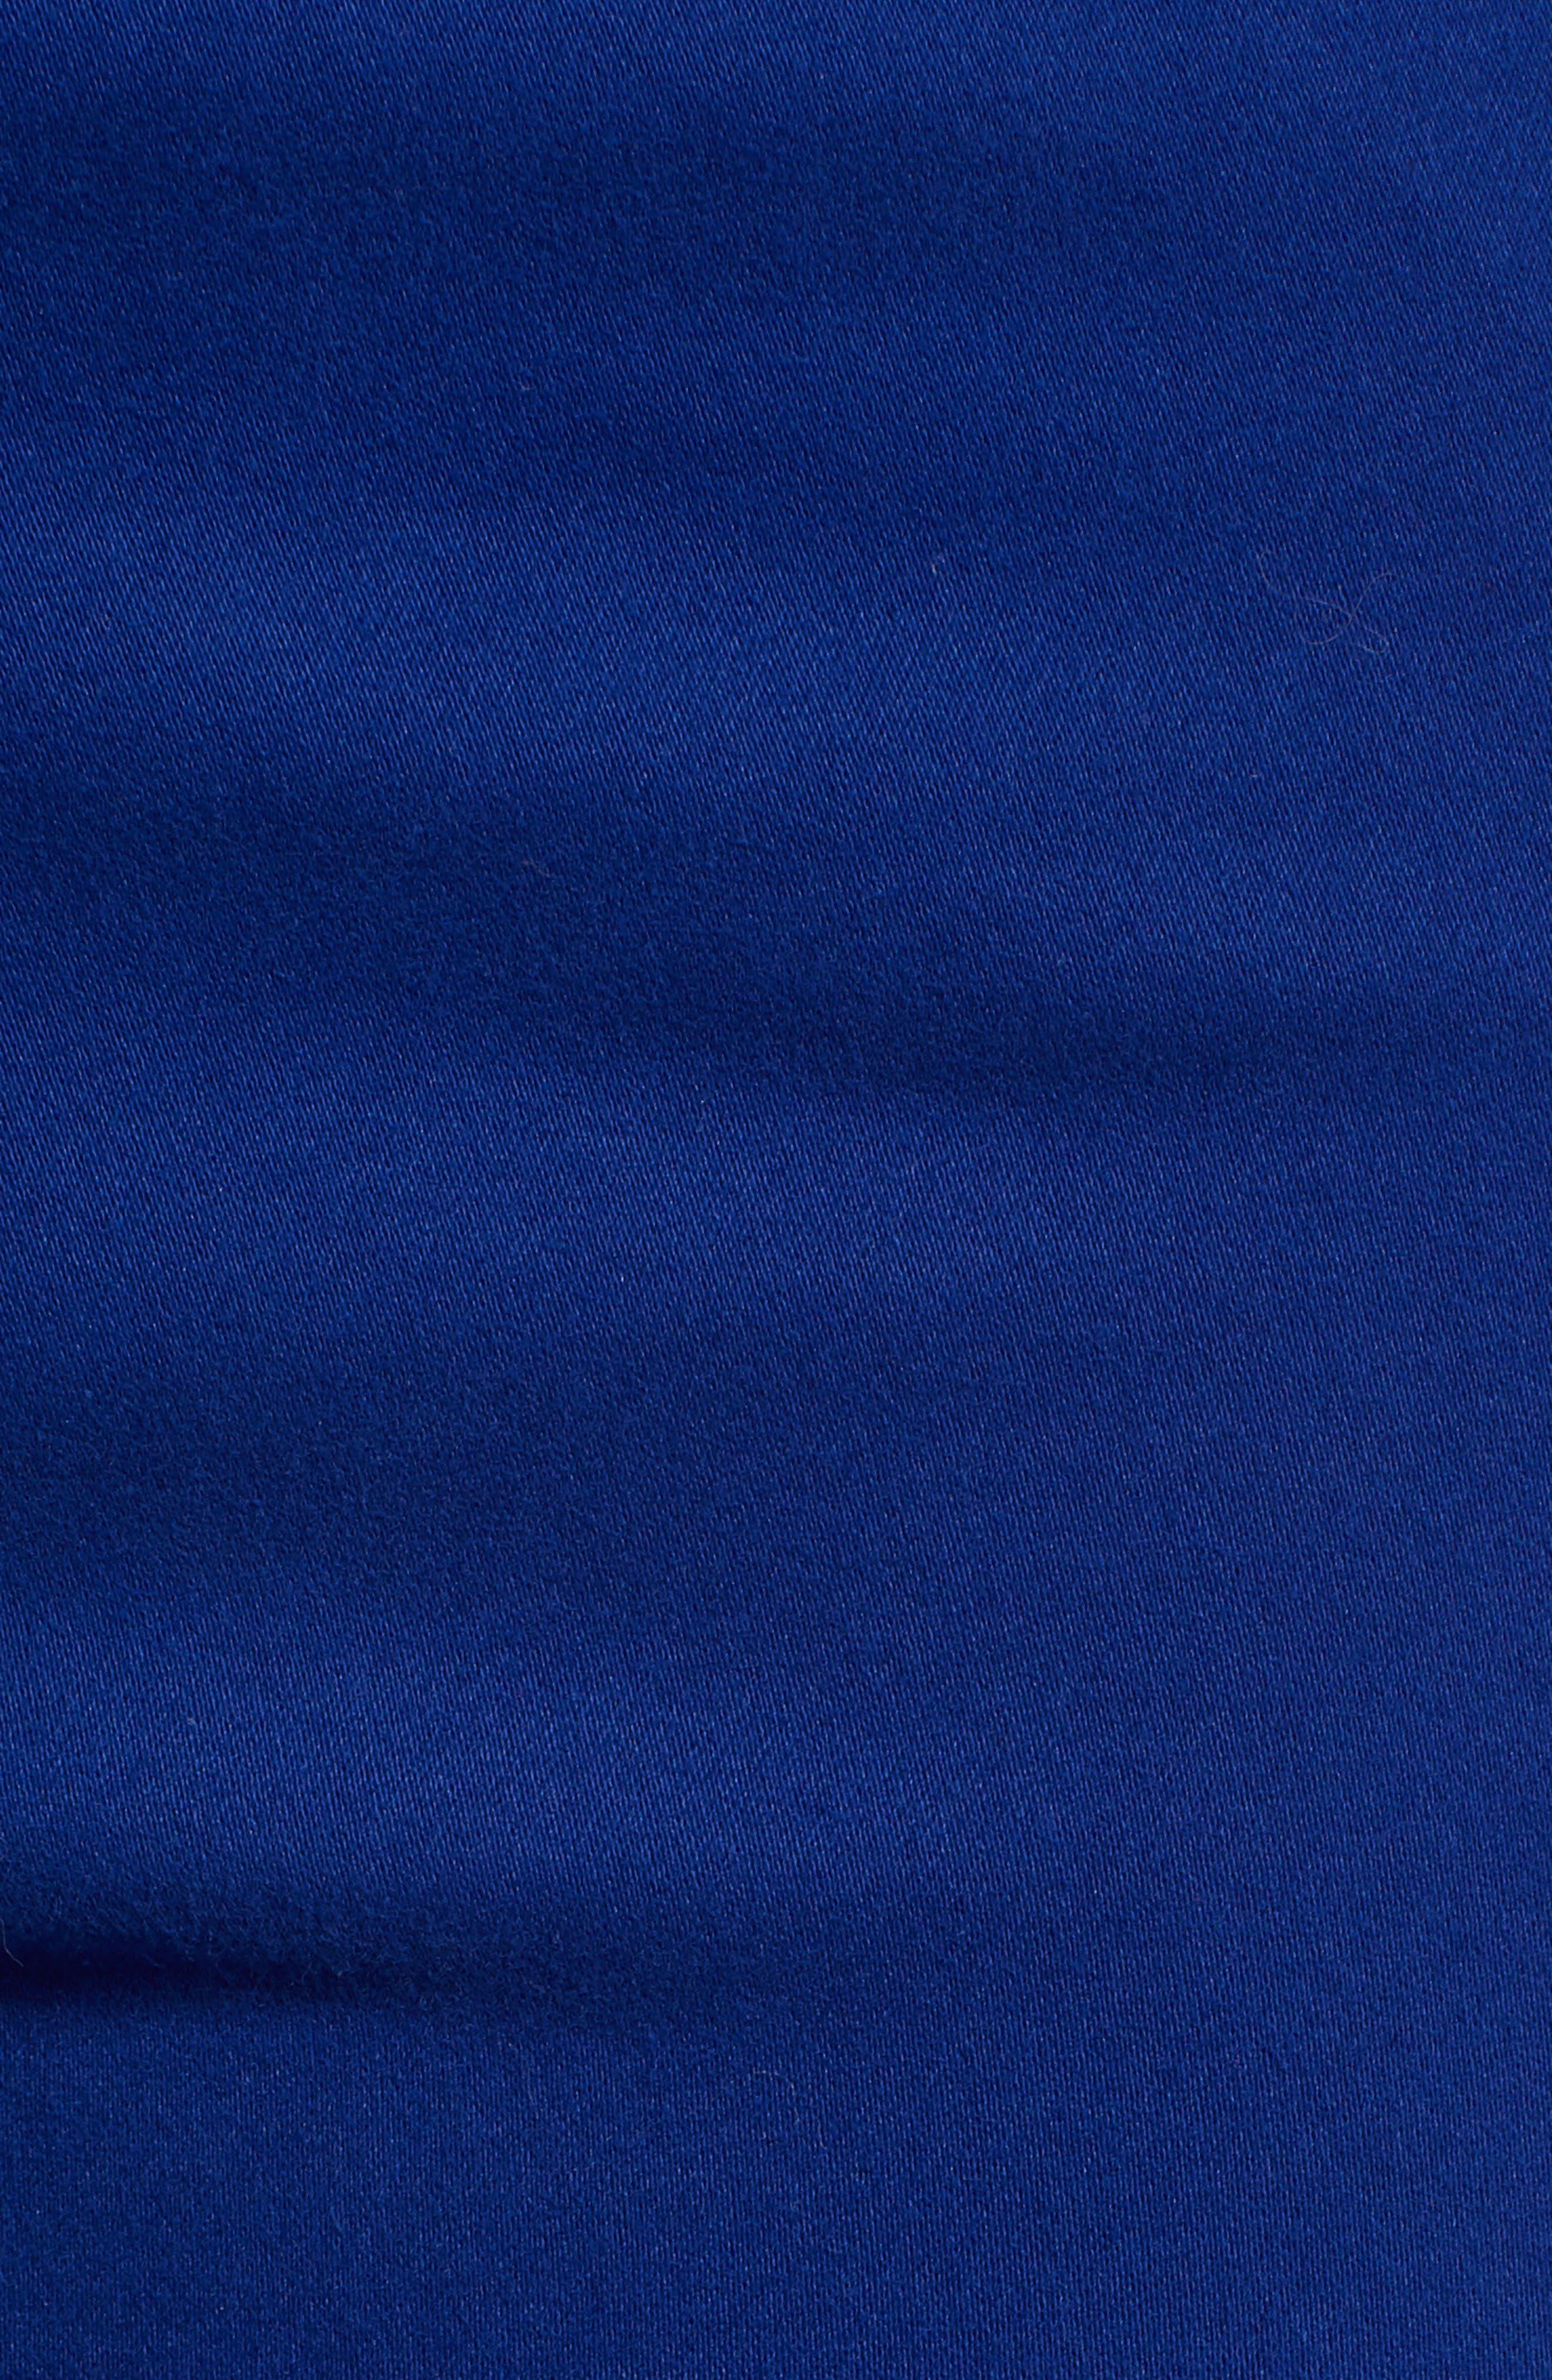 Farrah High Waist Ankle Skinny Jeans,                             Alternate thumbnail 6, color,                             EGYPTIAN BLUE